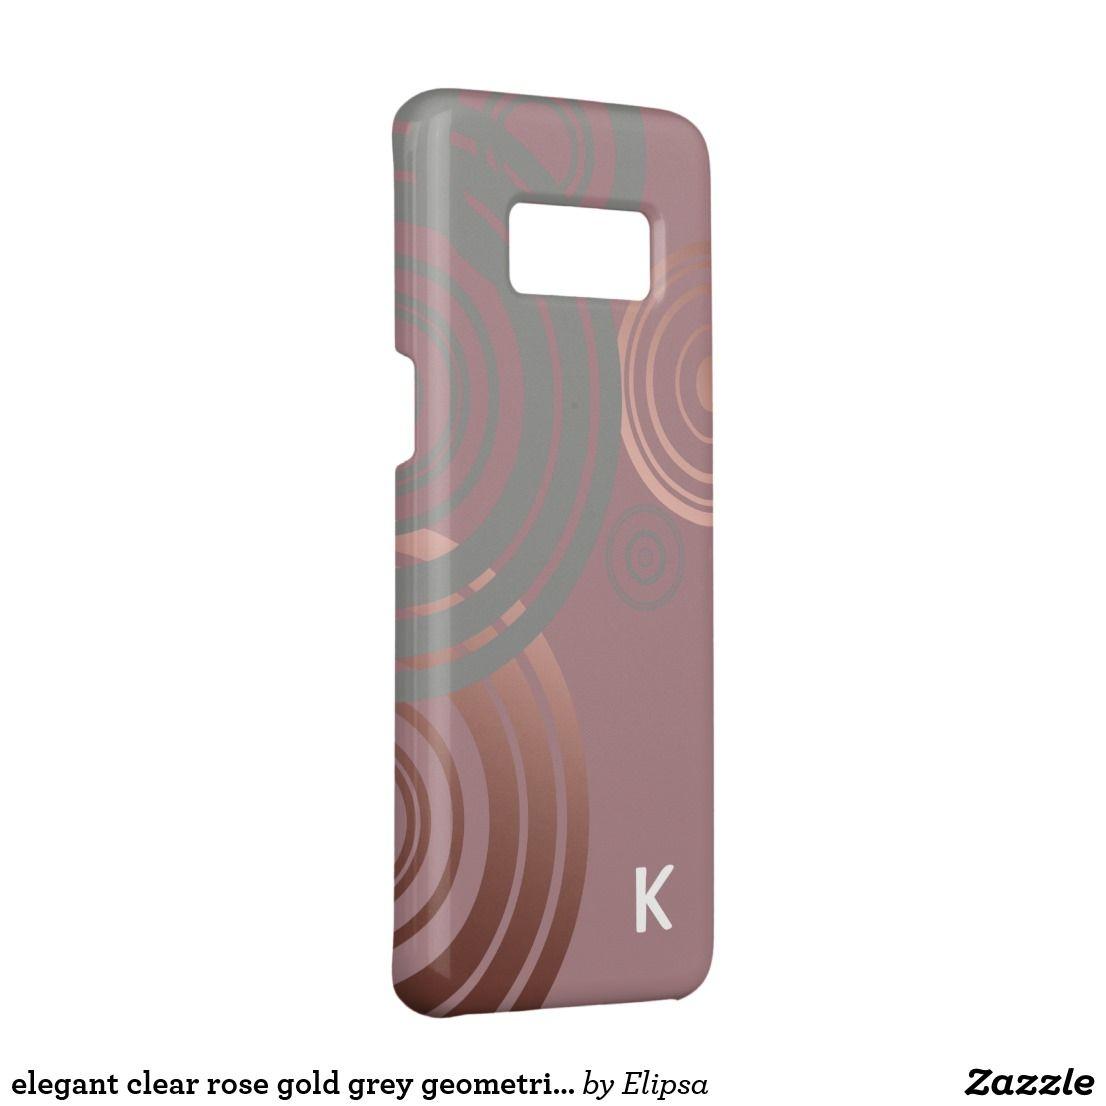 elegant clear rose gold grey geometric circles Case-Mate samsung galaxy s8 case